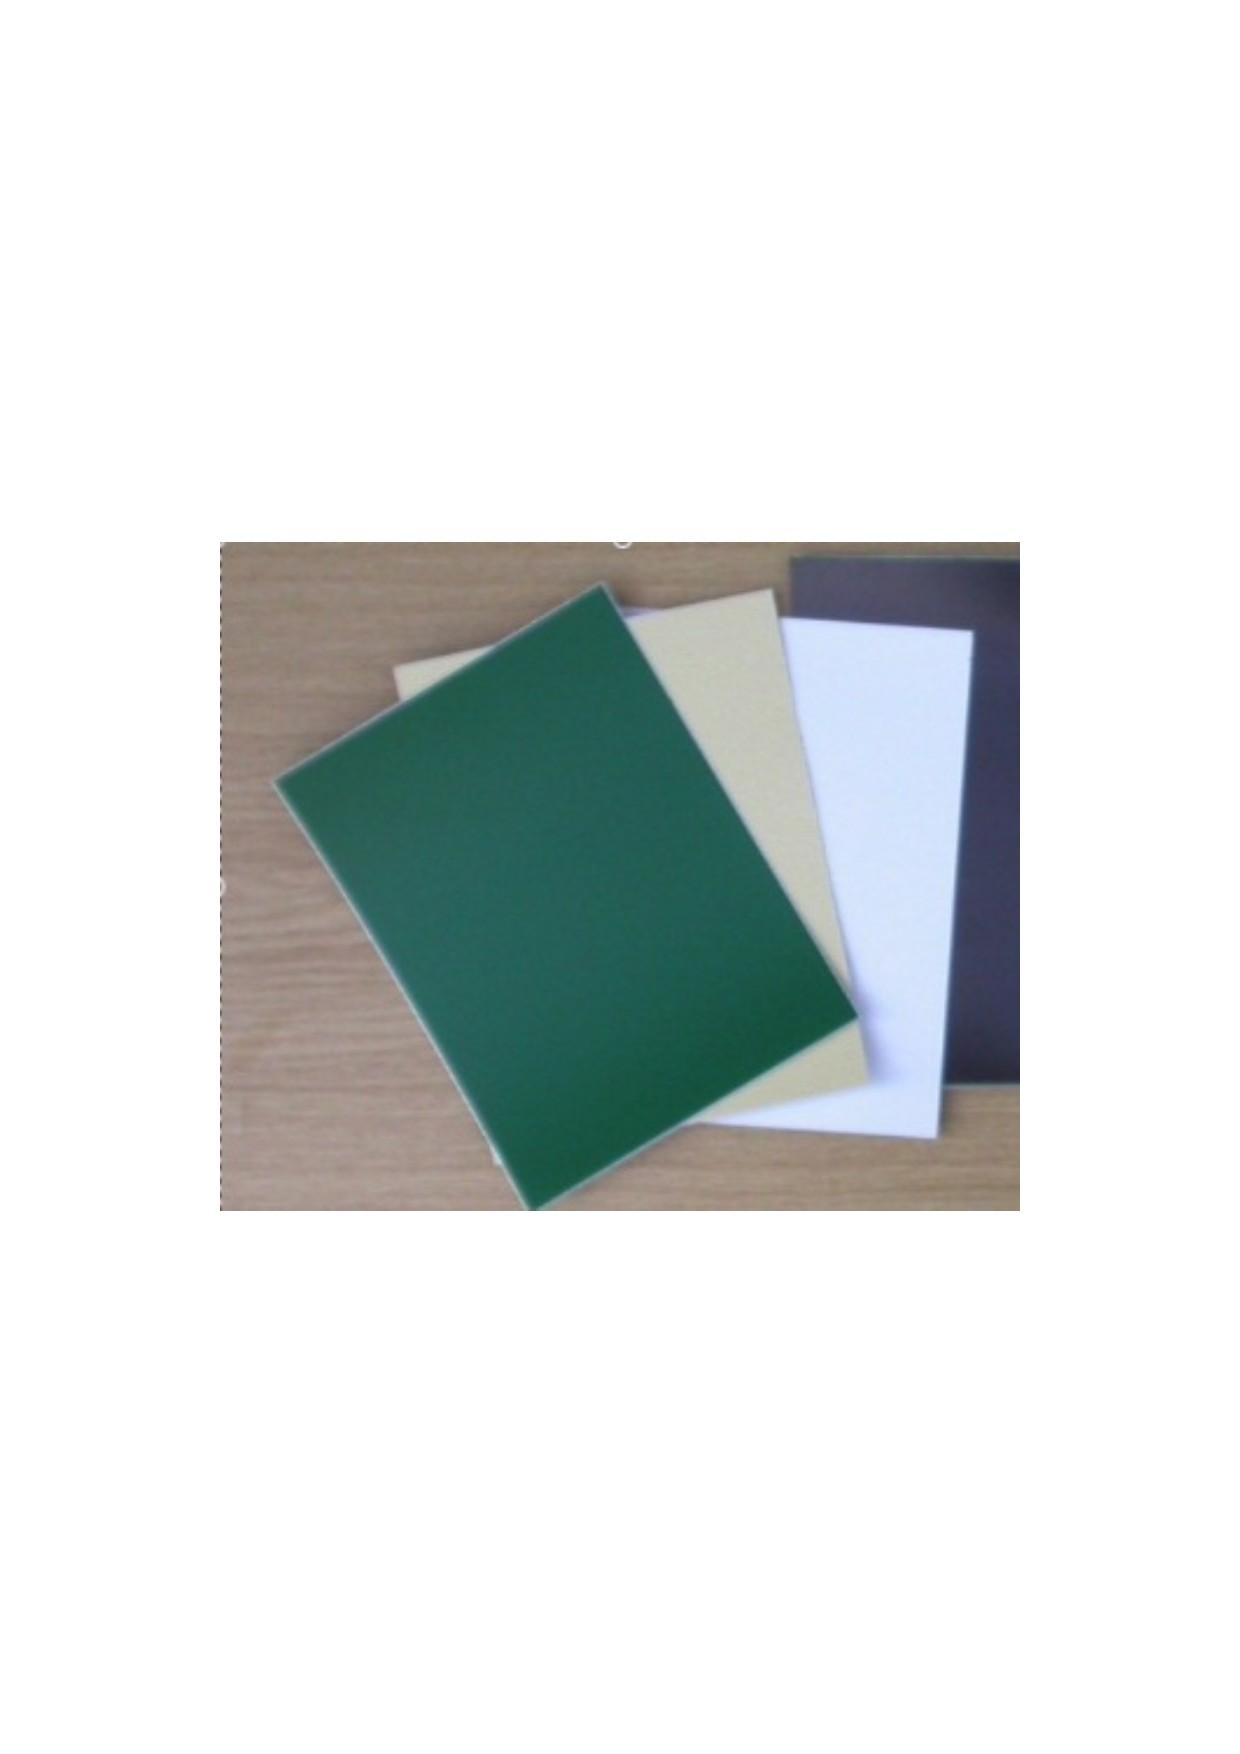 feuille autocollante verte (15cm x 20cm)